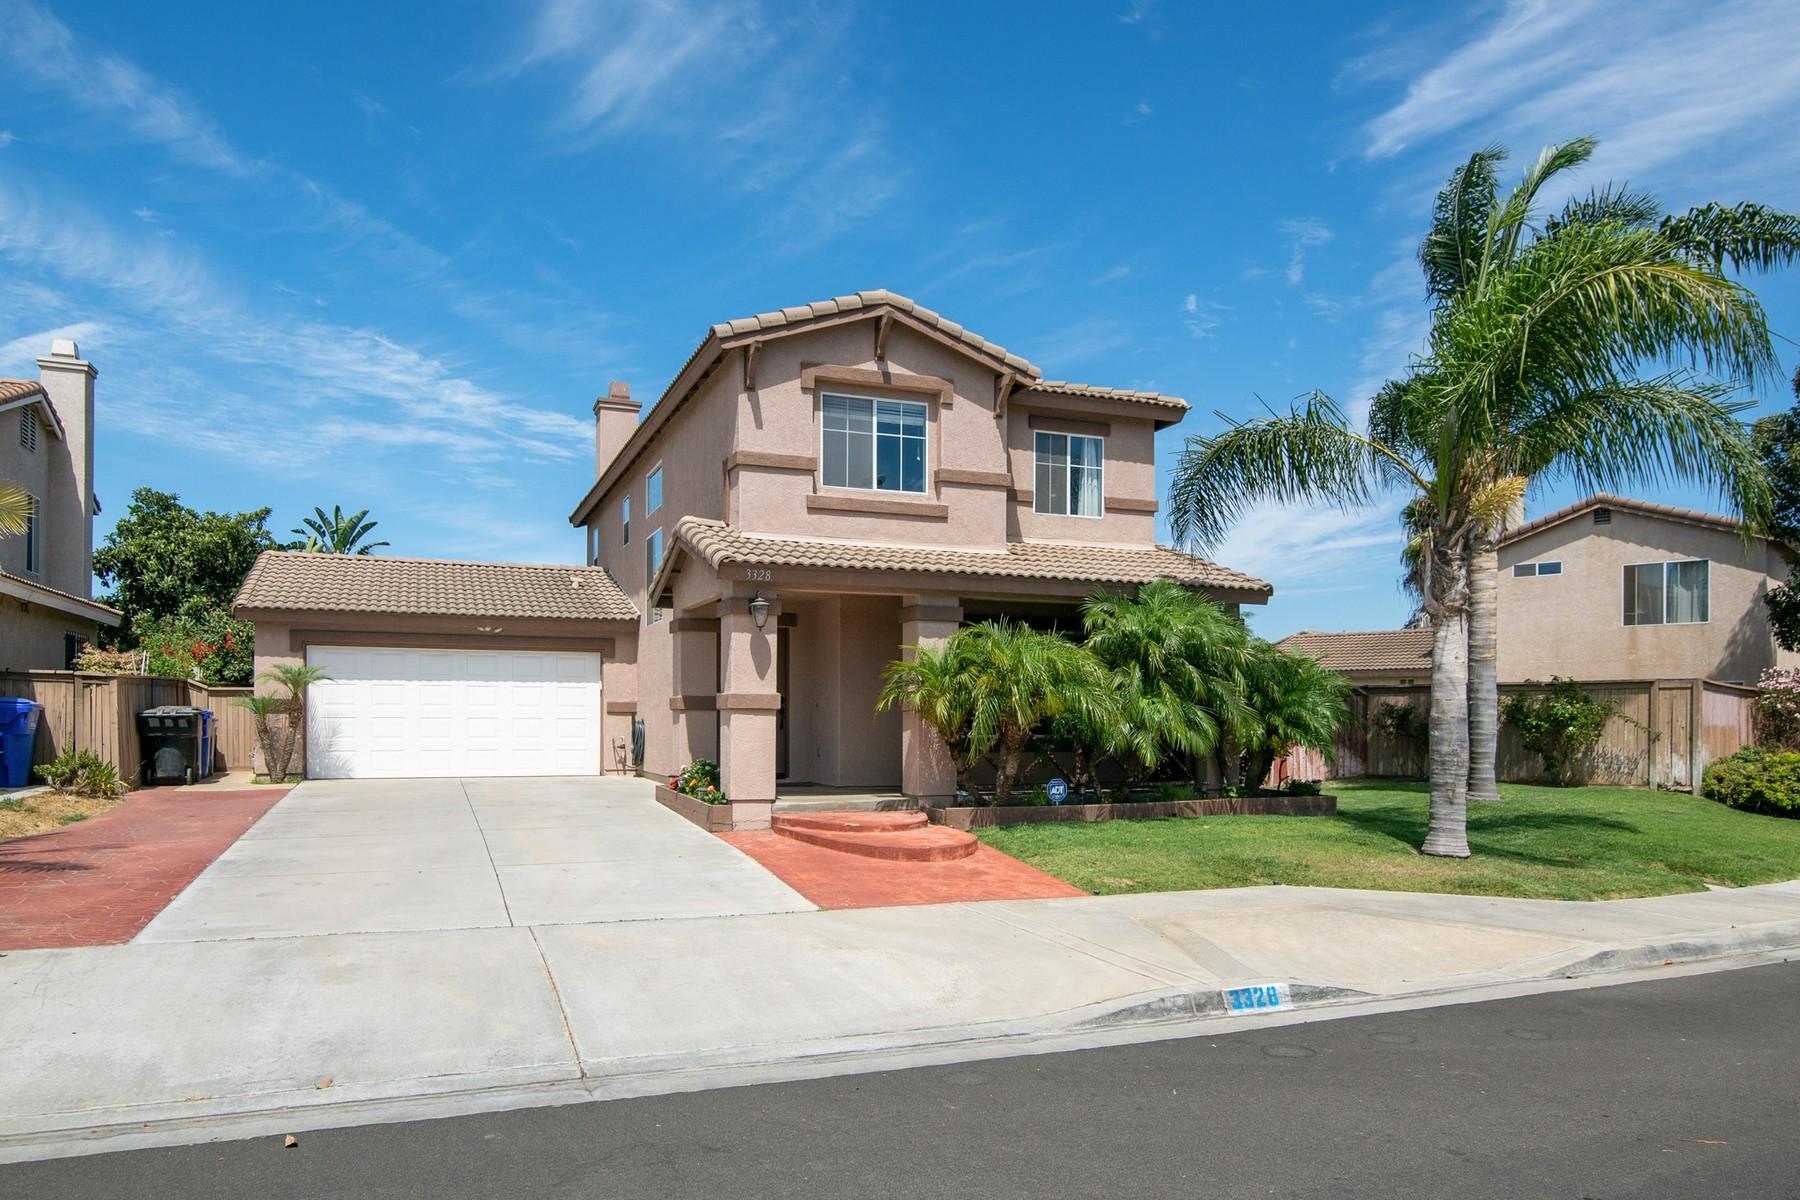 Single Family Homes for Sale at 3328 Anella Road 3328 Anella Rd San Ysidro, California 92173 United States